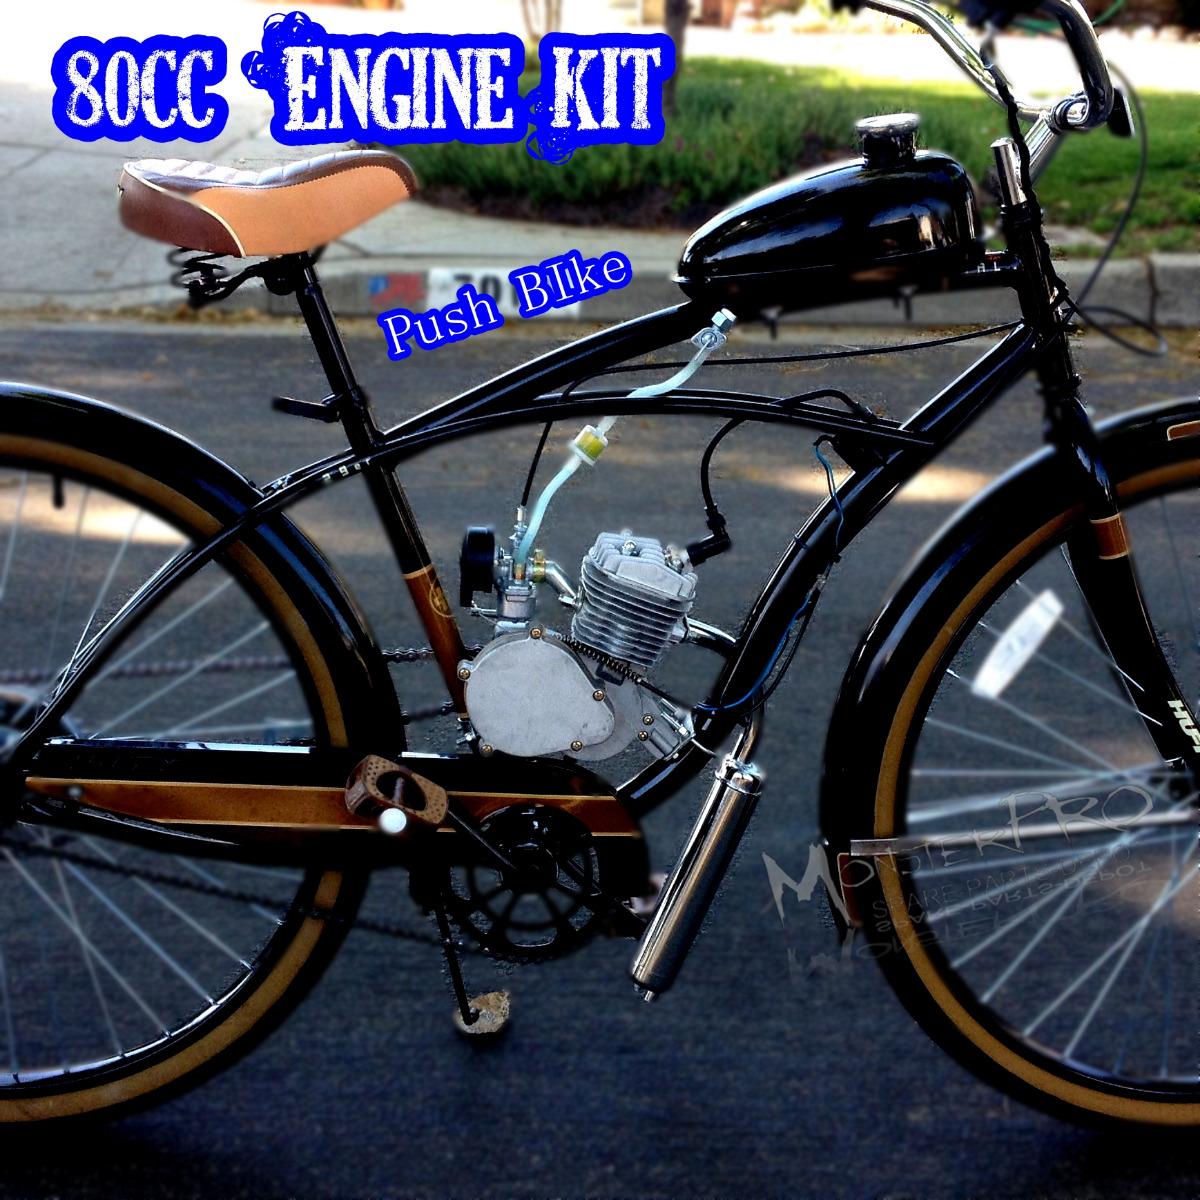 High Performance 2 Stroke 80cc Motorized Push Bike Motor